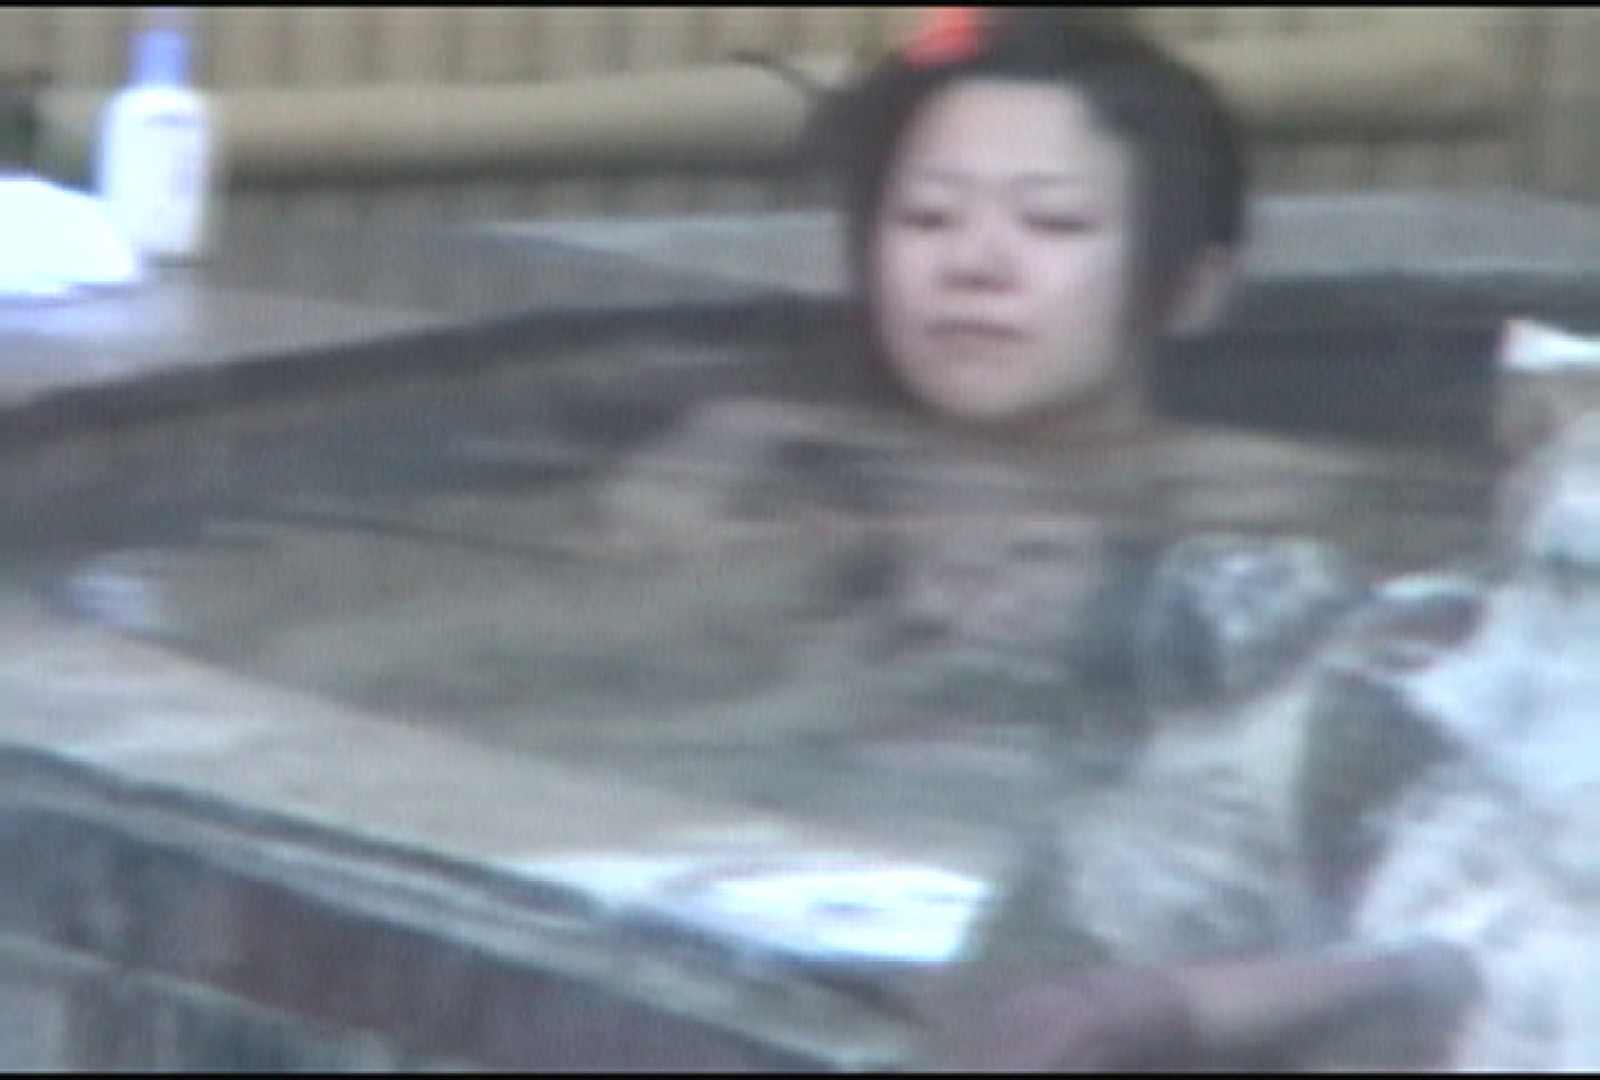 Aquaな露天風呂Vol.175 OLのエロ生活 | 露天風呂  71連発 25